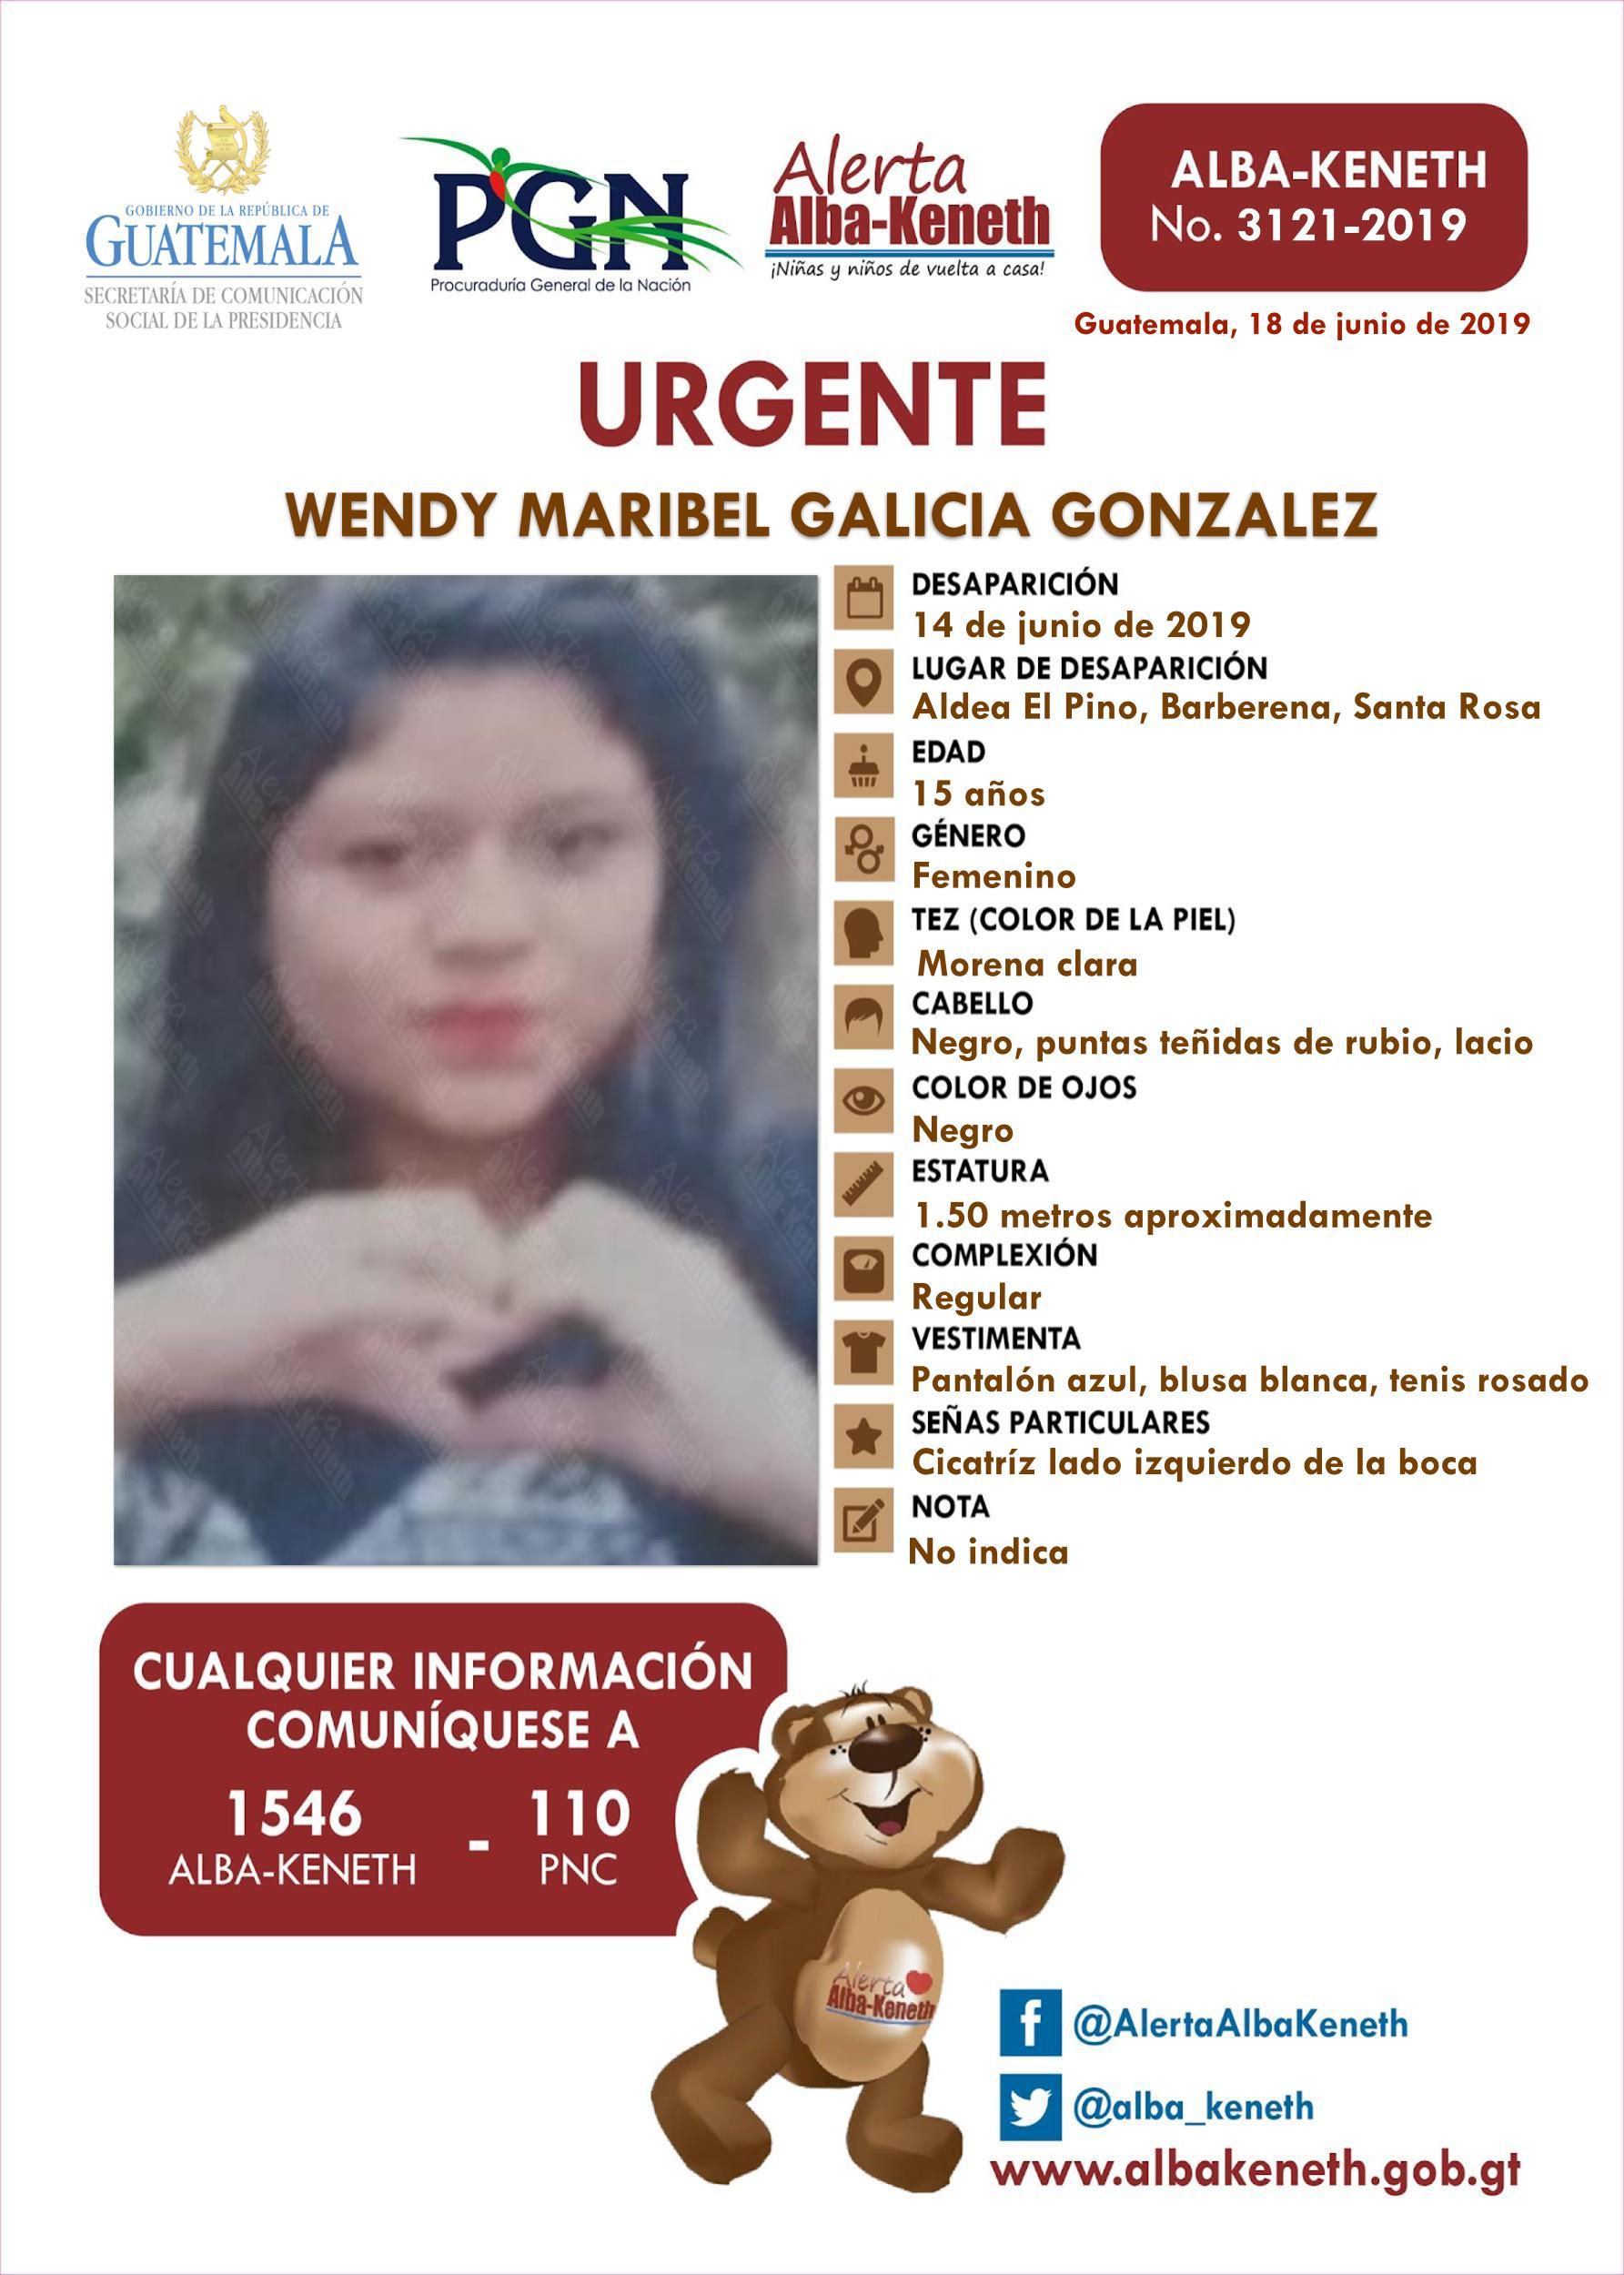 Wendy Maribel Galicia Gonzalez